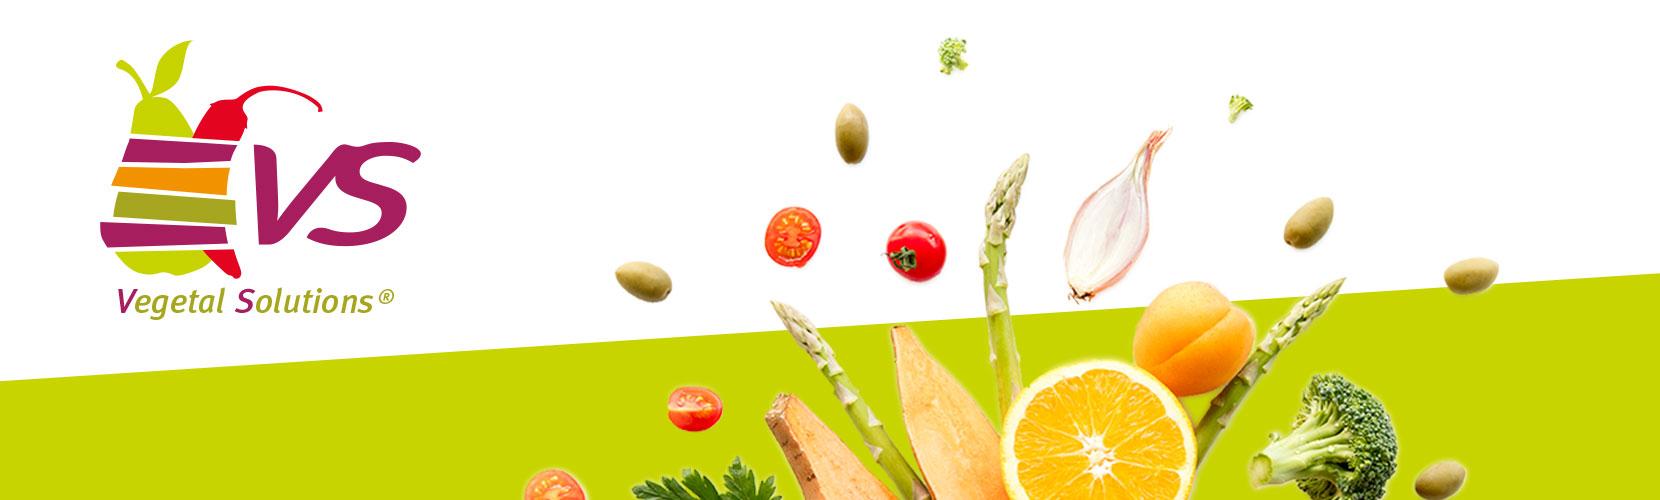 Témoignage : Vegetal Solutions